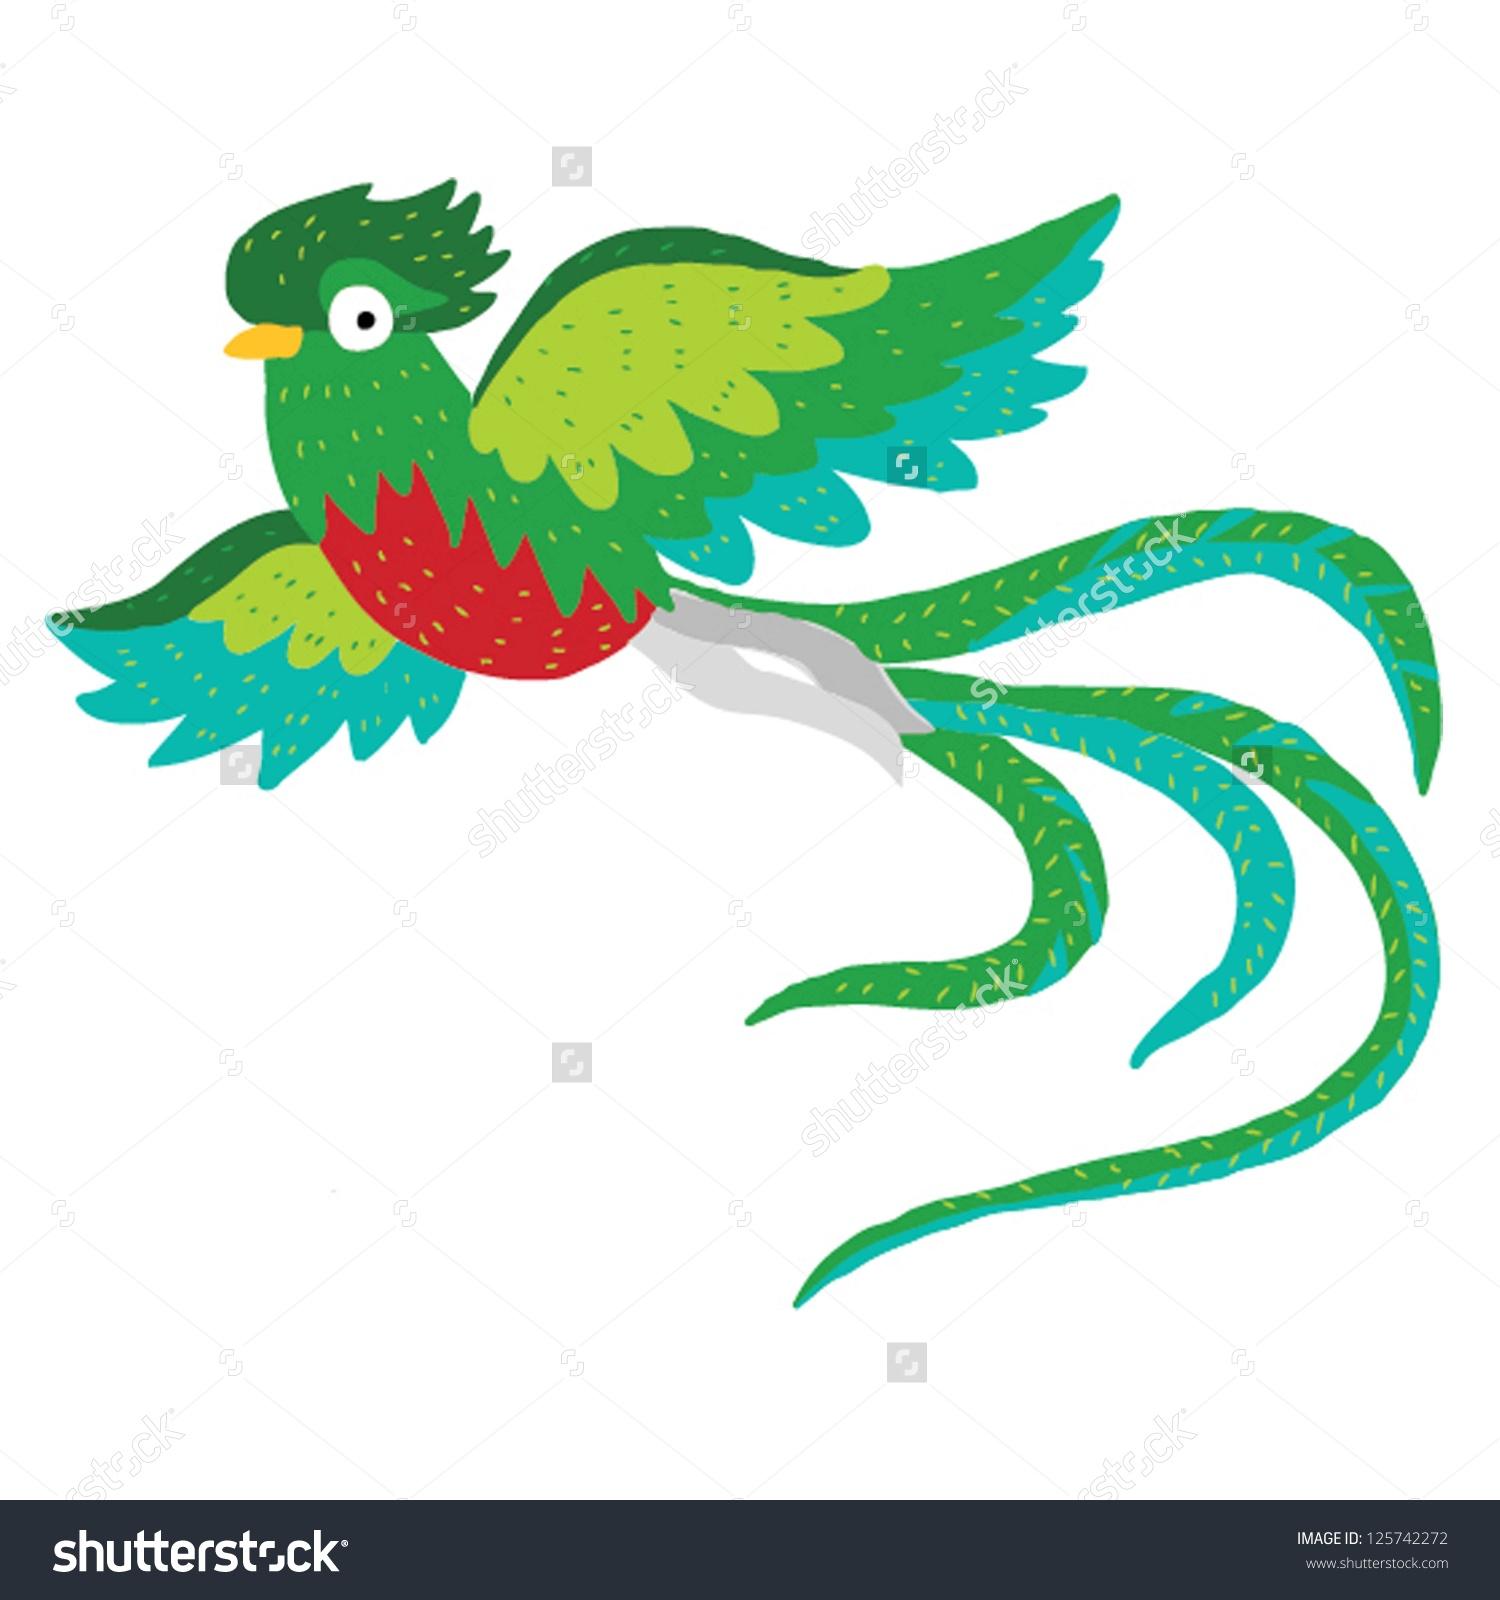 Quetzal clipart, Download Quetzal clipart for free 2019